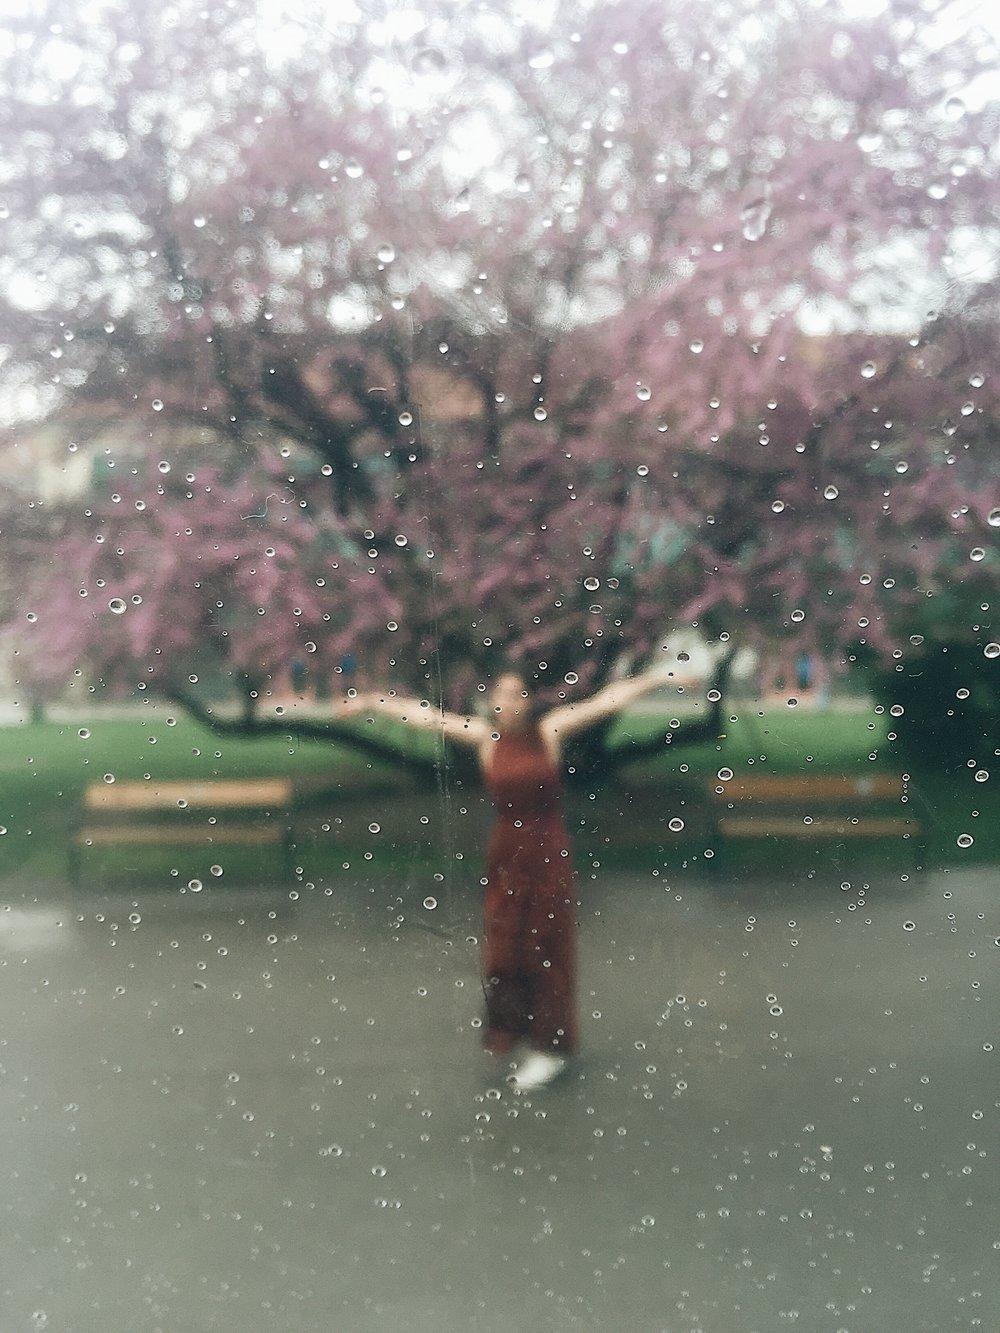 singing in the rain, i´m singing in the rain..